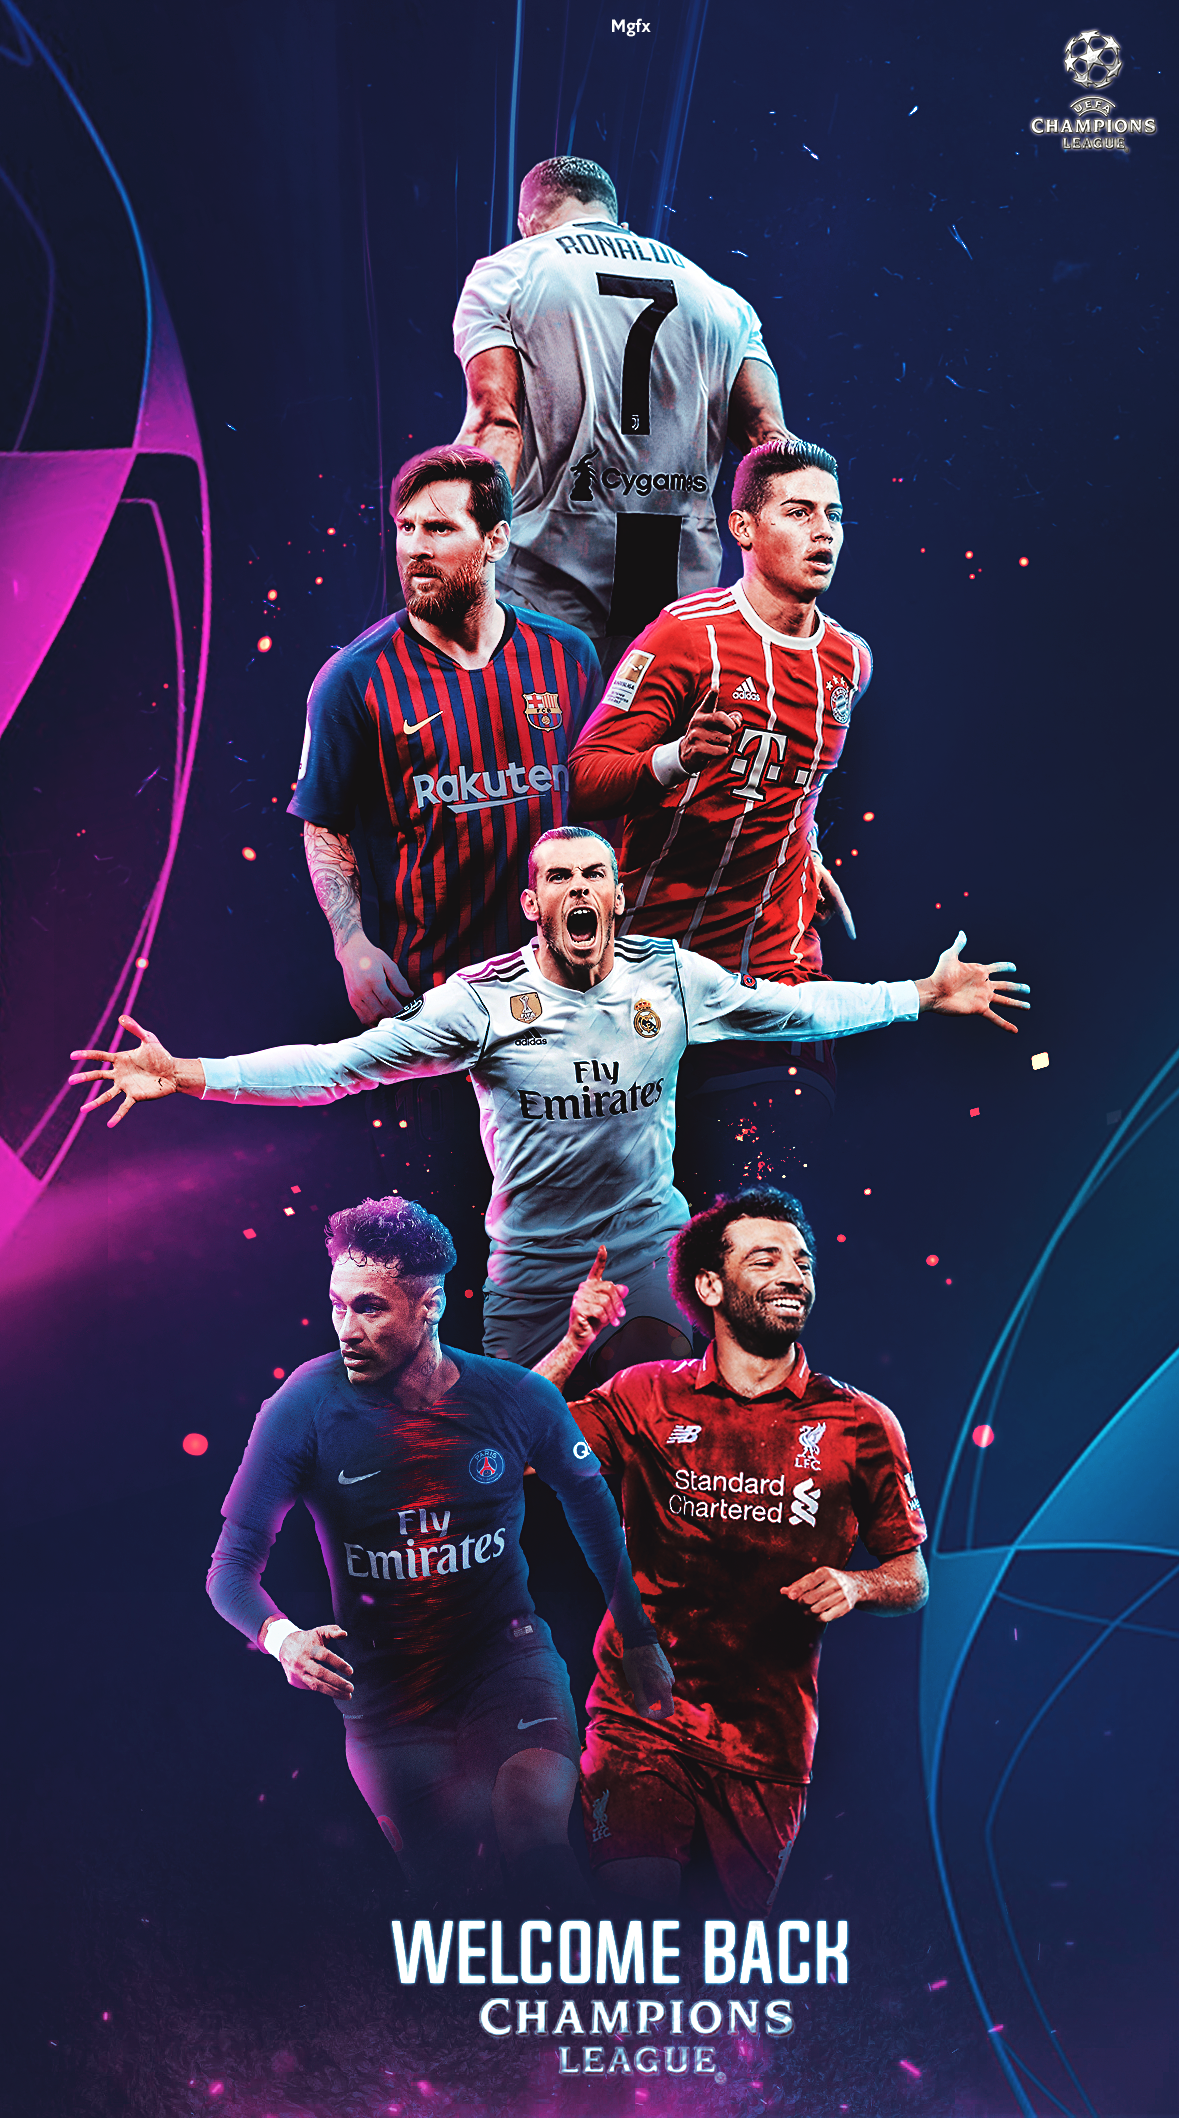 uefa champions league wallpaper lockscreen by mohamedgfx10 on deviantart uefa champions league wallpaper